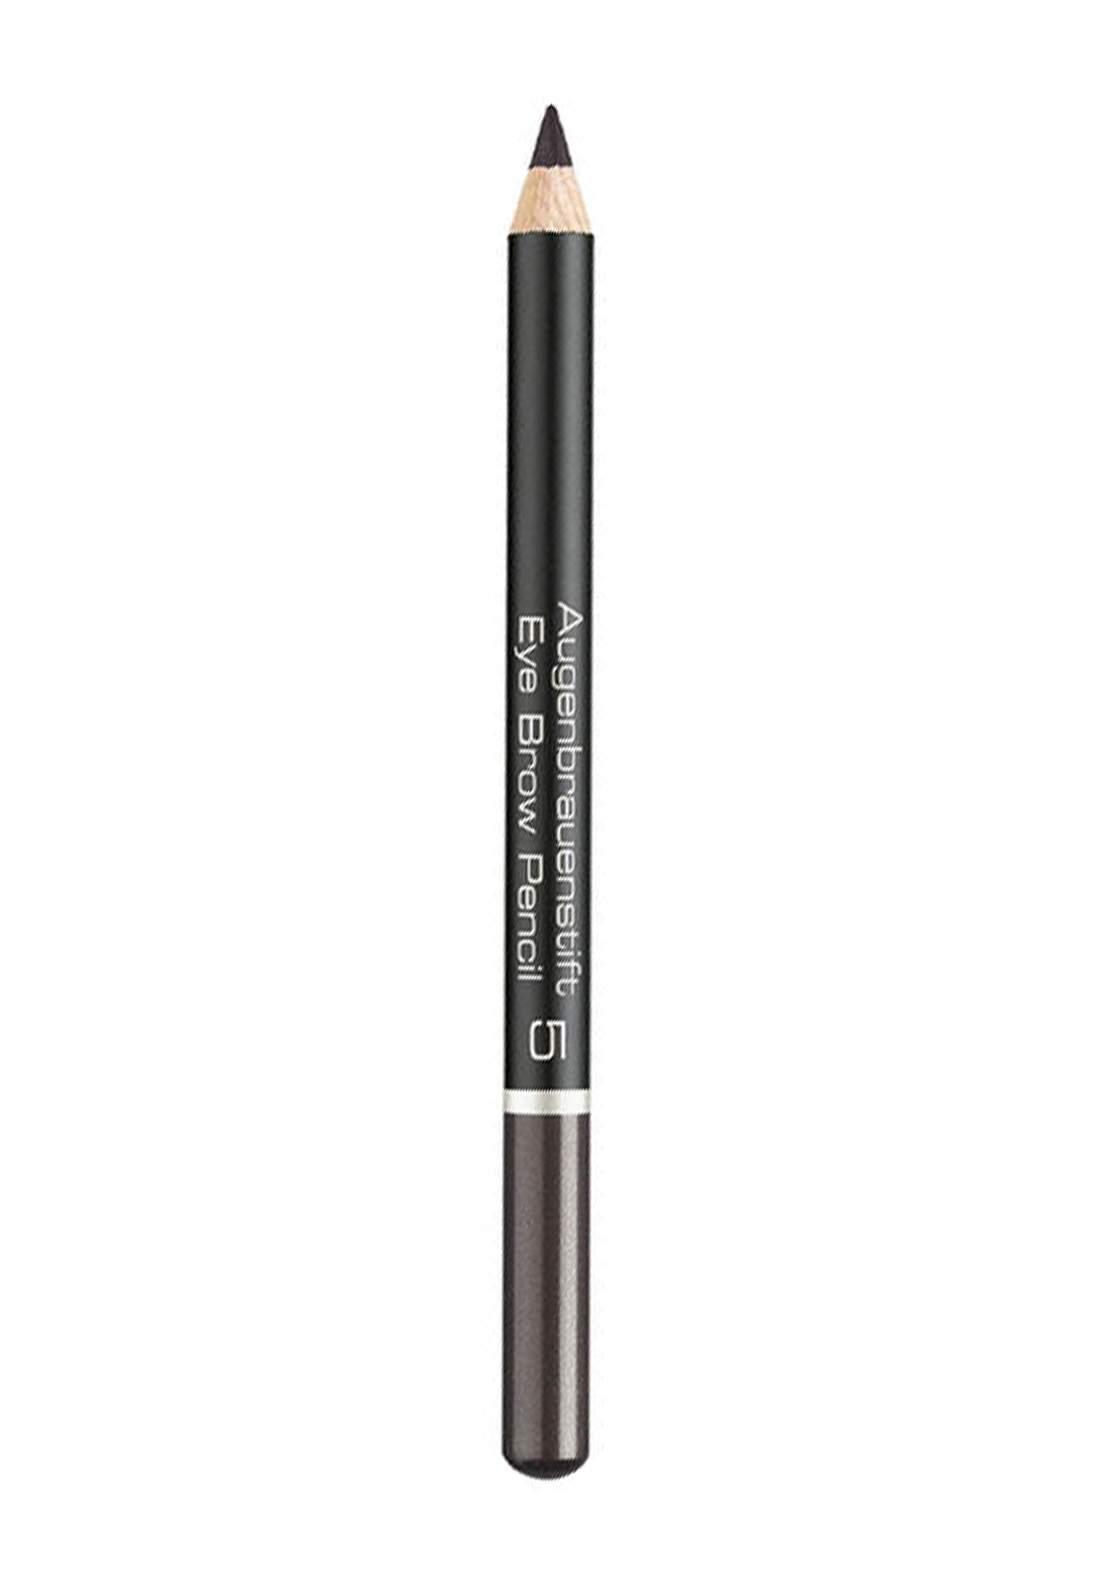 Artdeco Eye Brow Pencil No. 6 Medium Grey Brown قلم حاجب